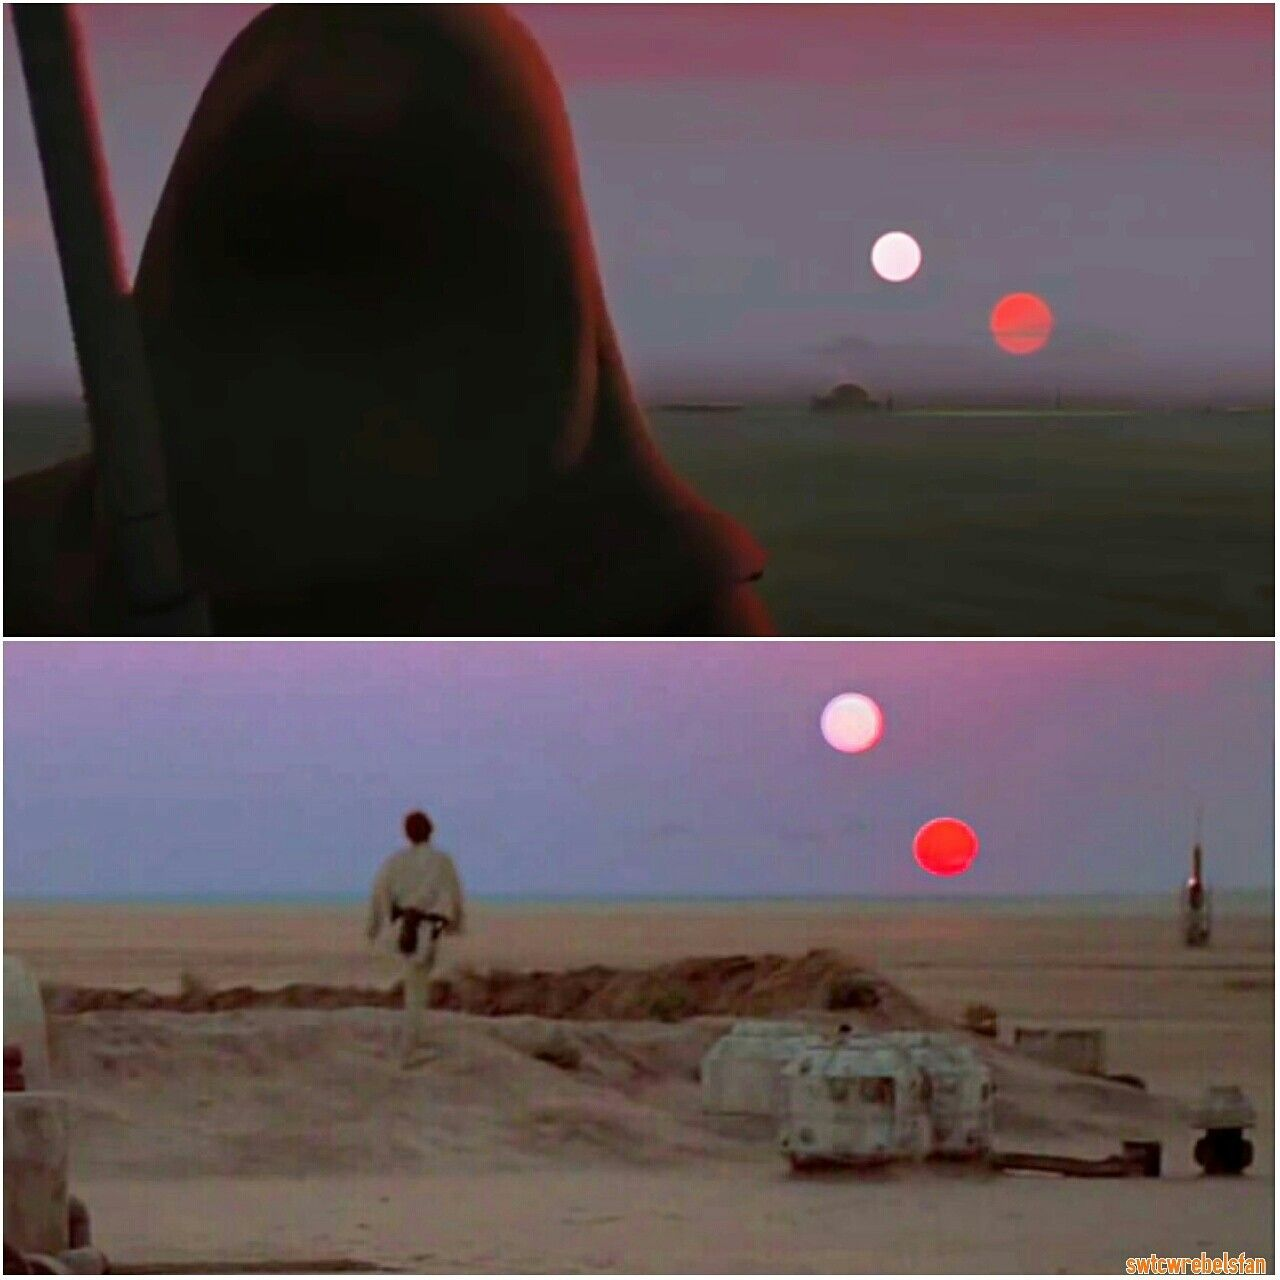 Twin Suns Similarscene In Starwarsrebels And Anewhope Starwars Twinsuns Tatooine Obiwankenobi Lukeskywalker Star Wars Rebels Star Wars Movie Star Wars